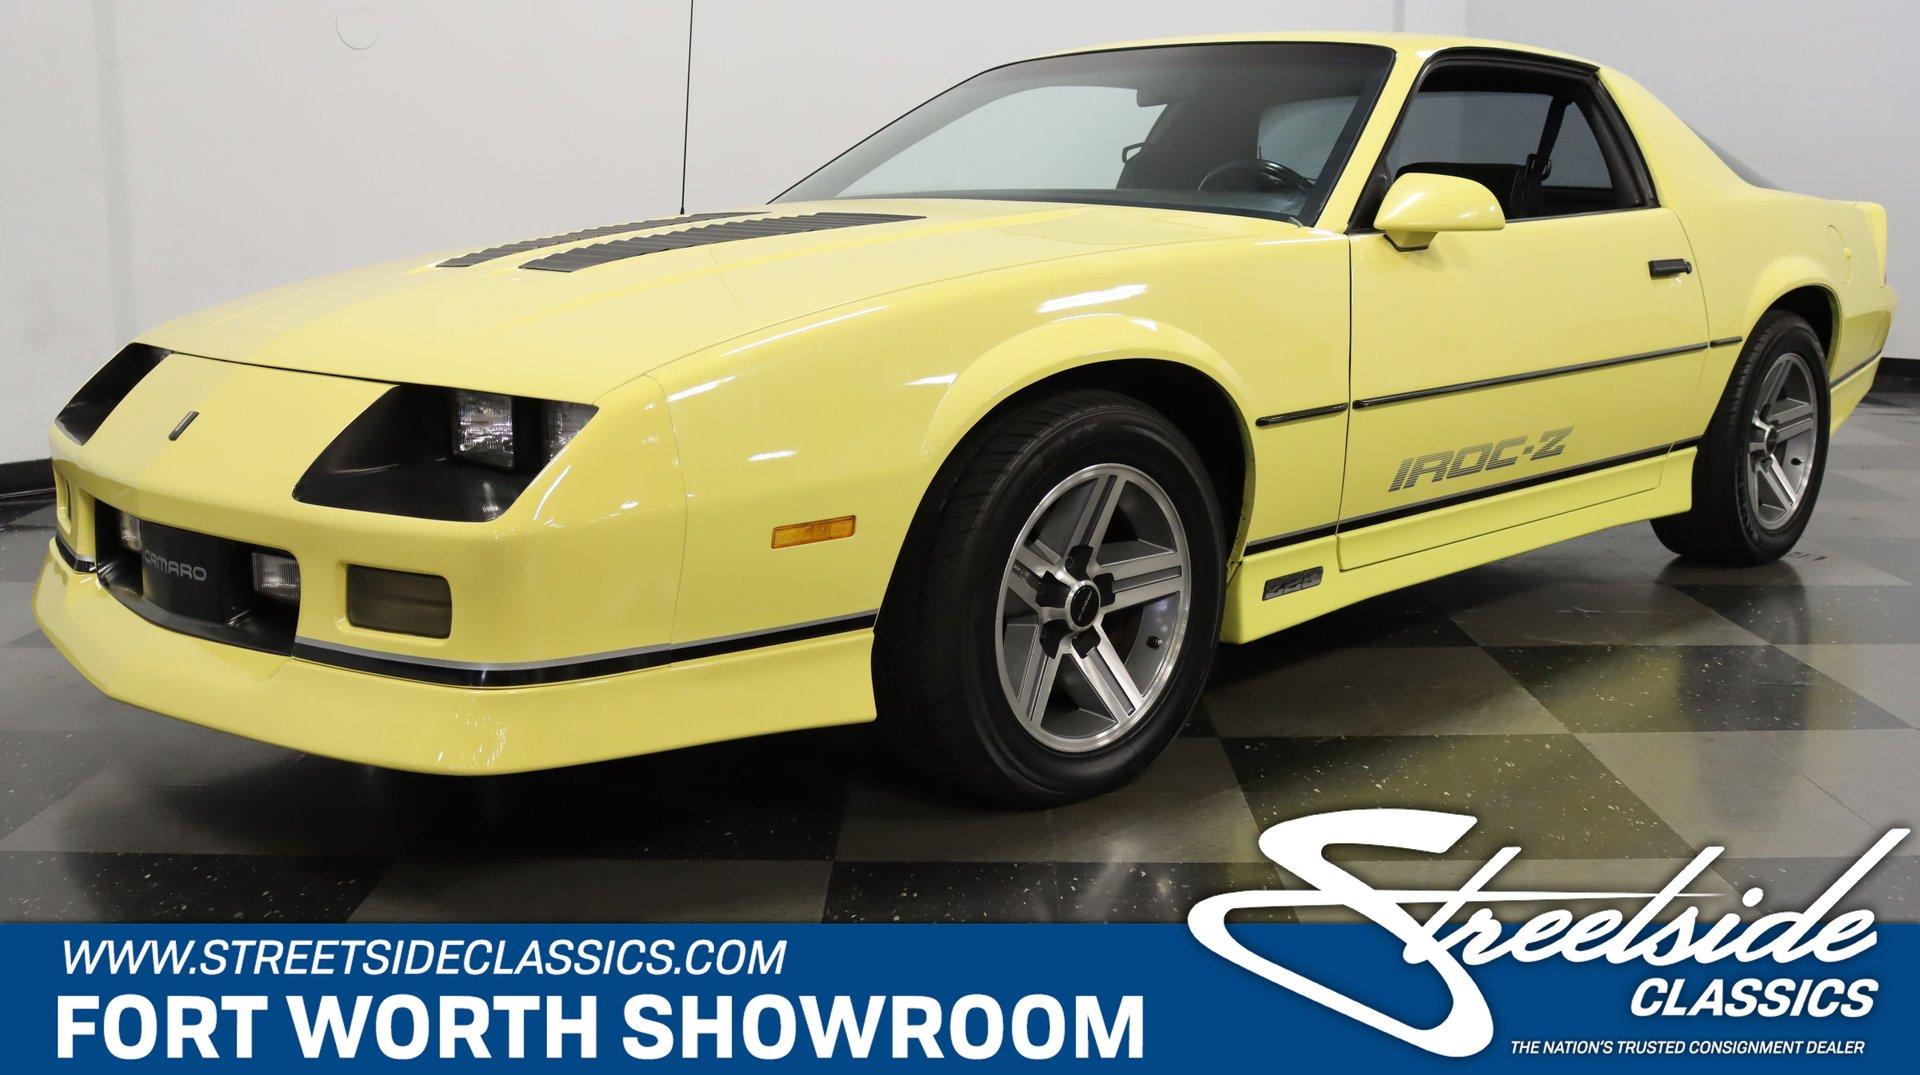 "Old Print Yellow 1985 Chevrolet Camaro /""IROC-Z/"" Auto Advertisment"